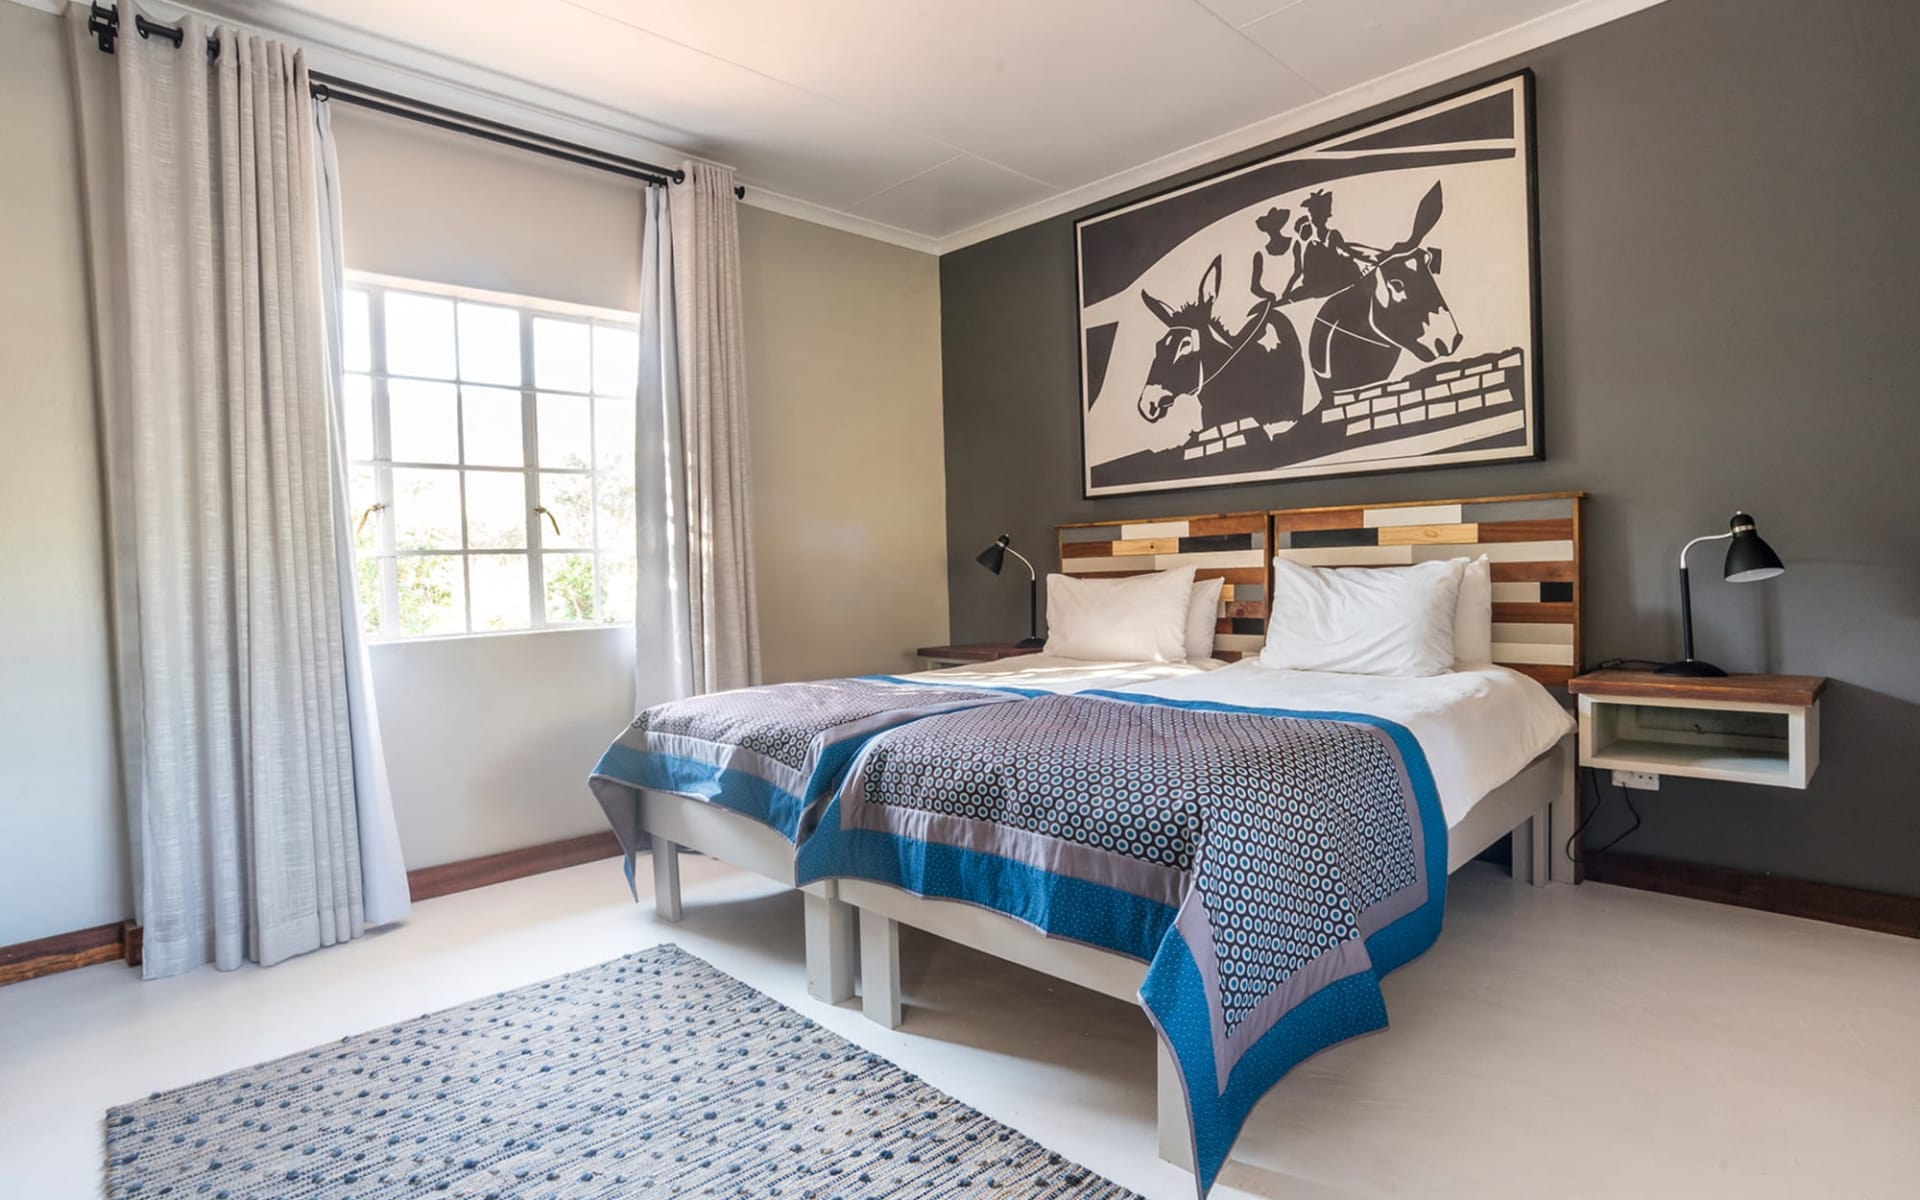 Damara Mopane Lodge in Khorixas Region: zimmer Damara Mopane Lodge - zimmer mit Bett